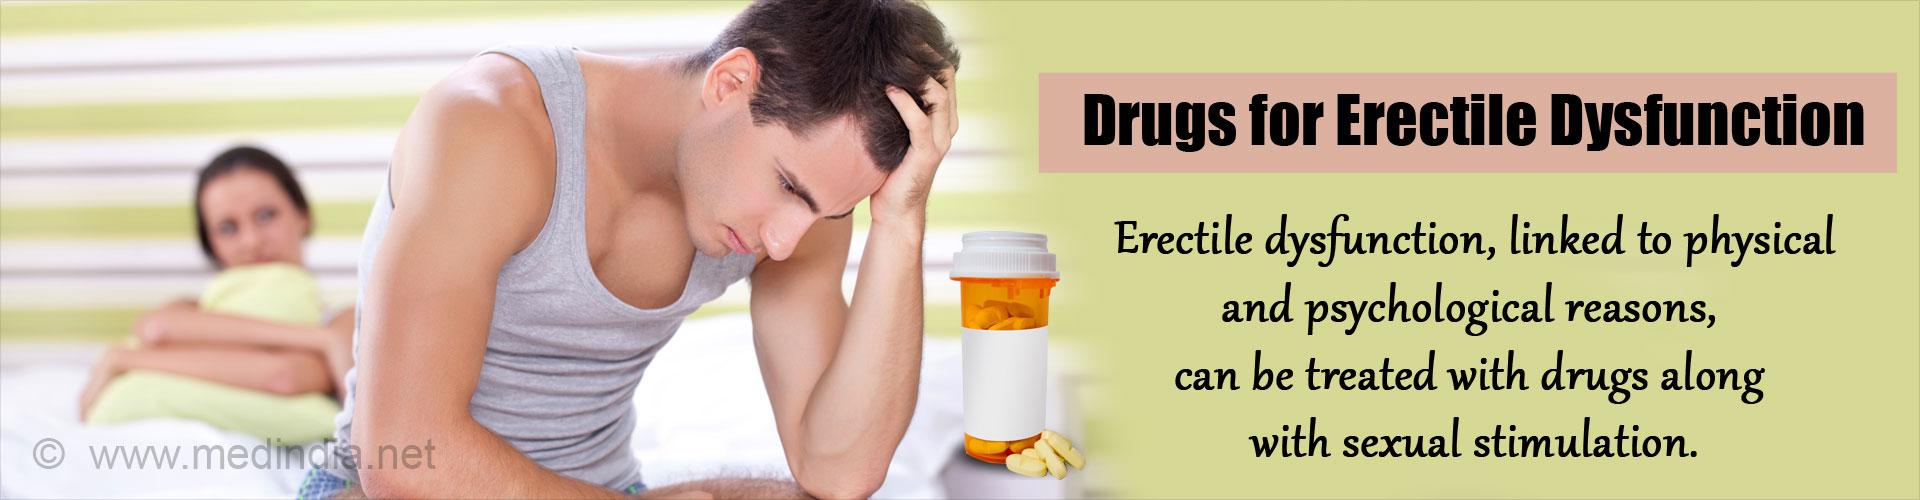 Drugs for Erectile Dysfunction